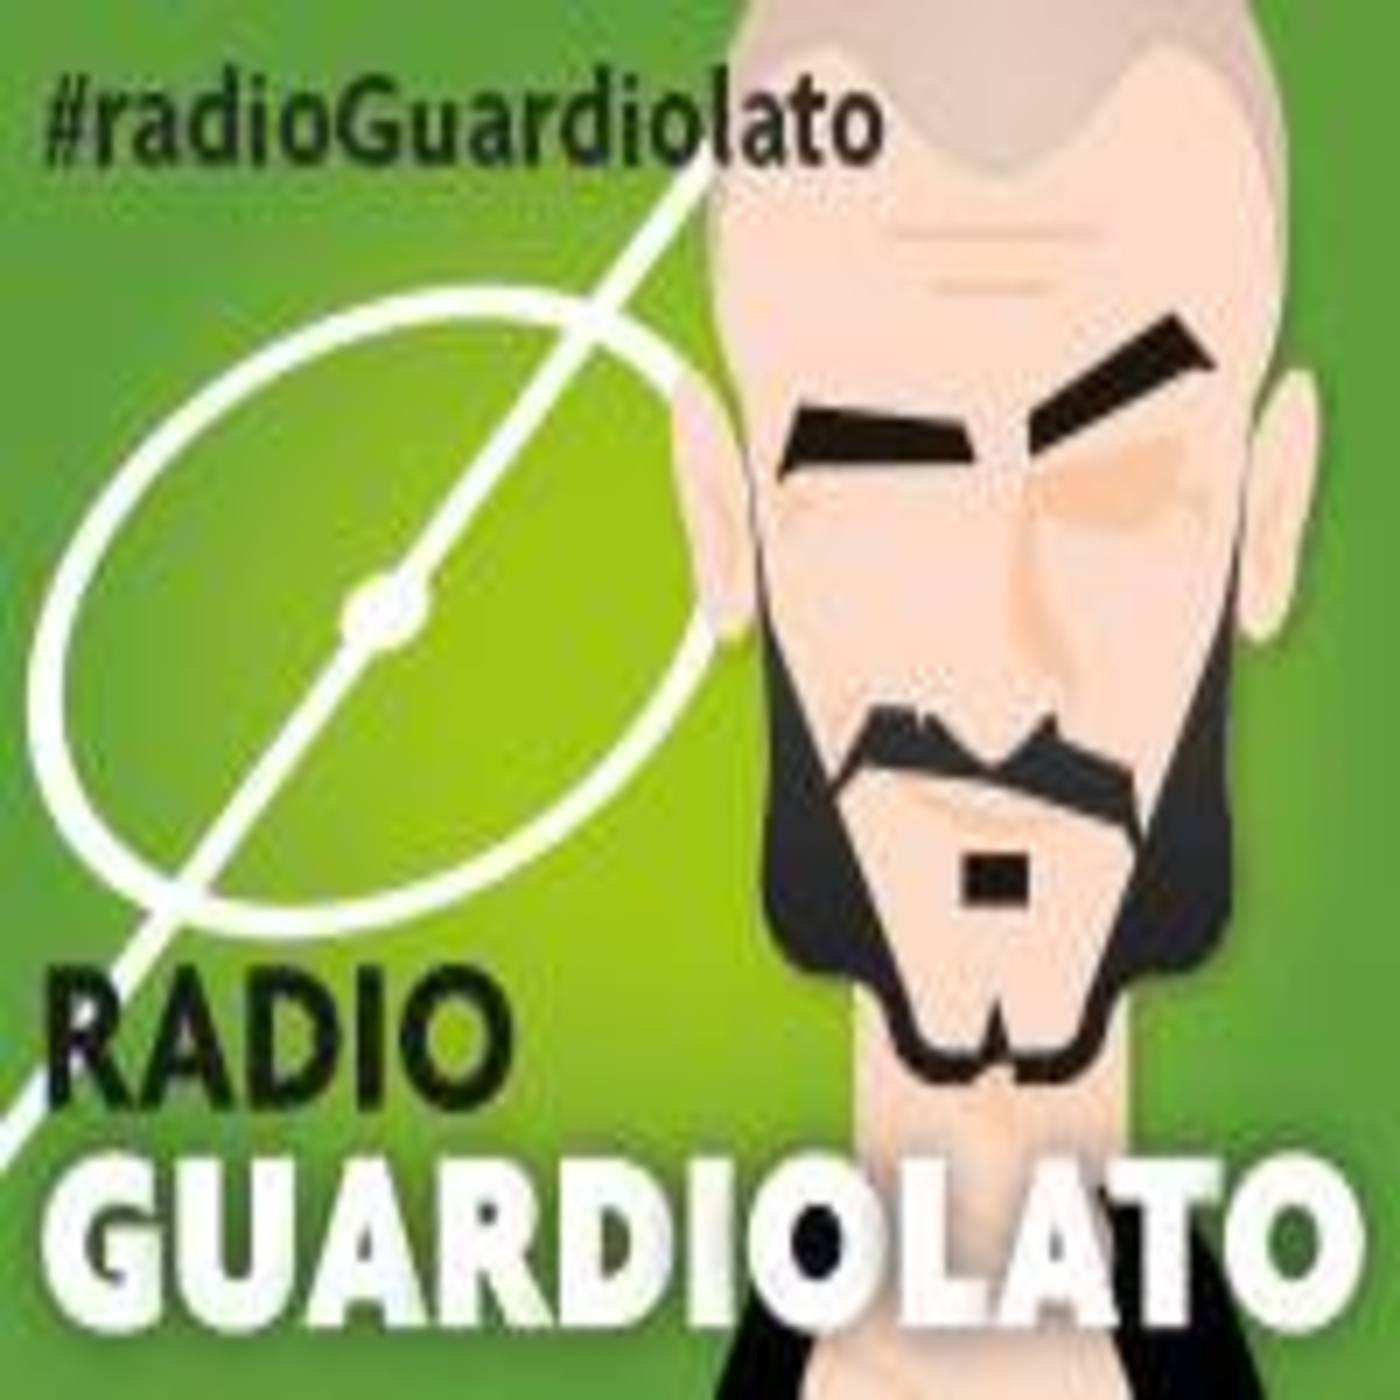 <![CDATA[Radio Guardiolato]]>